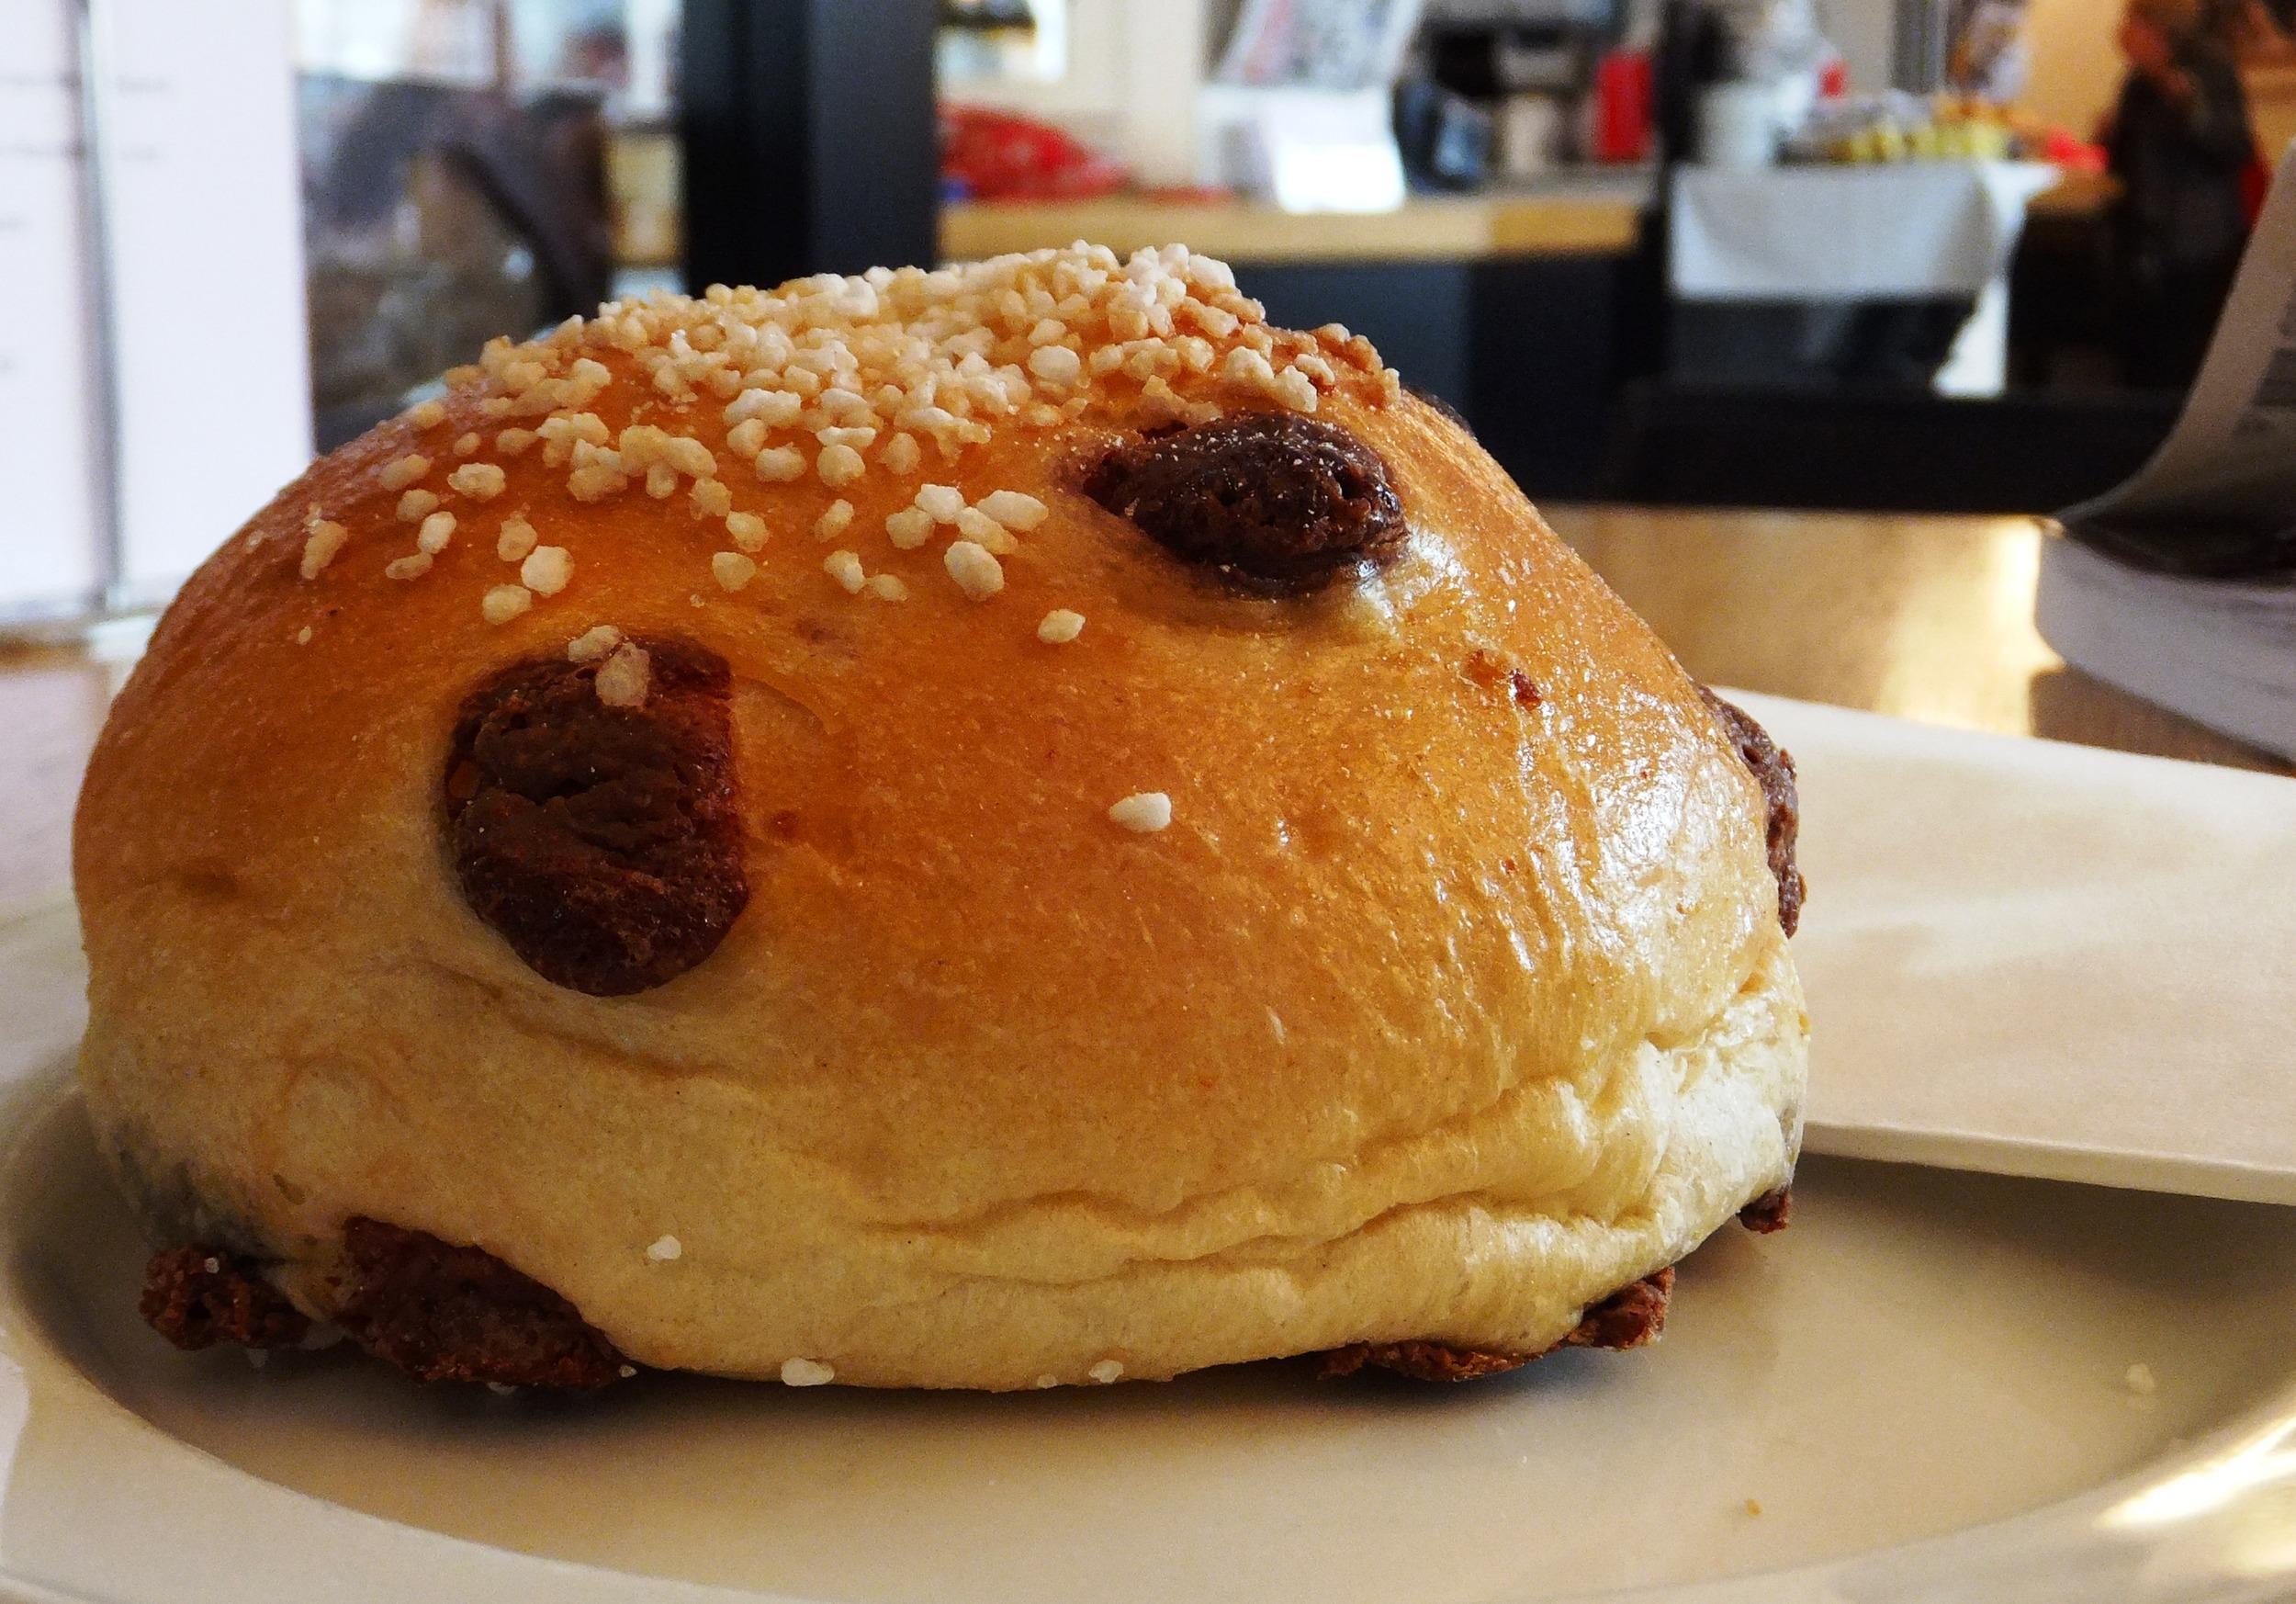 DSCF4148 Chocolate Bread